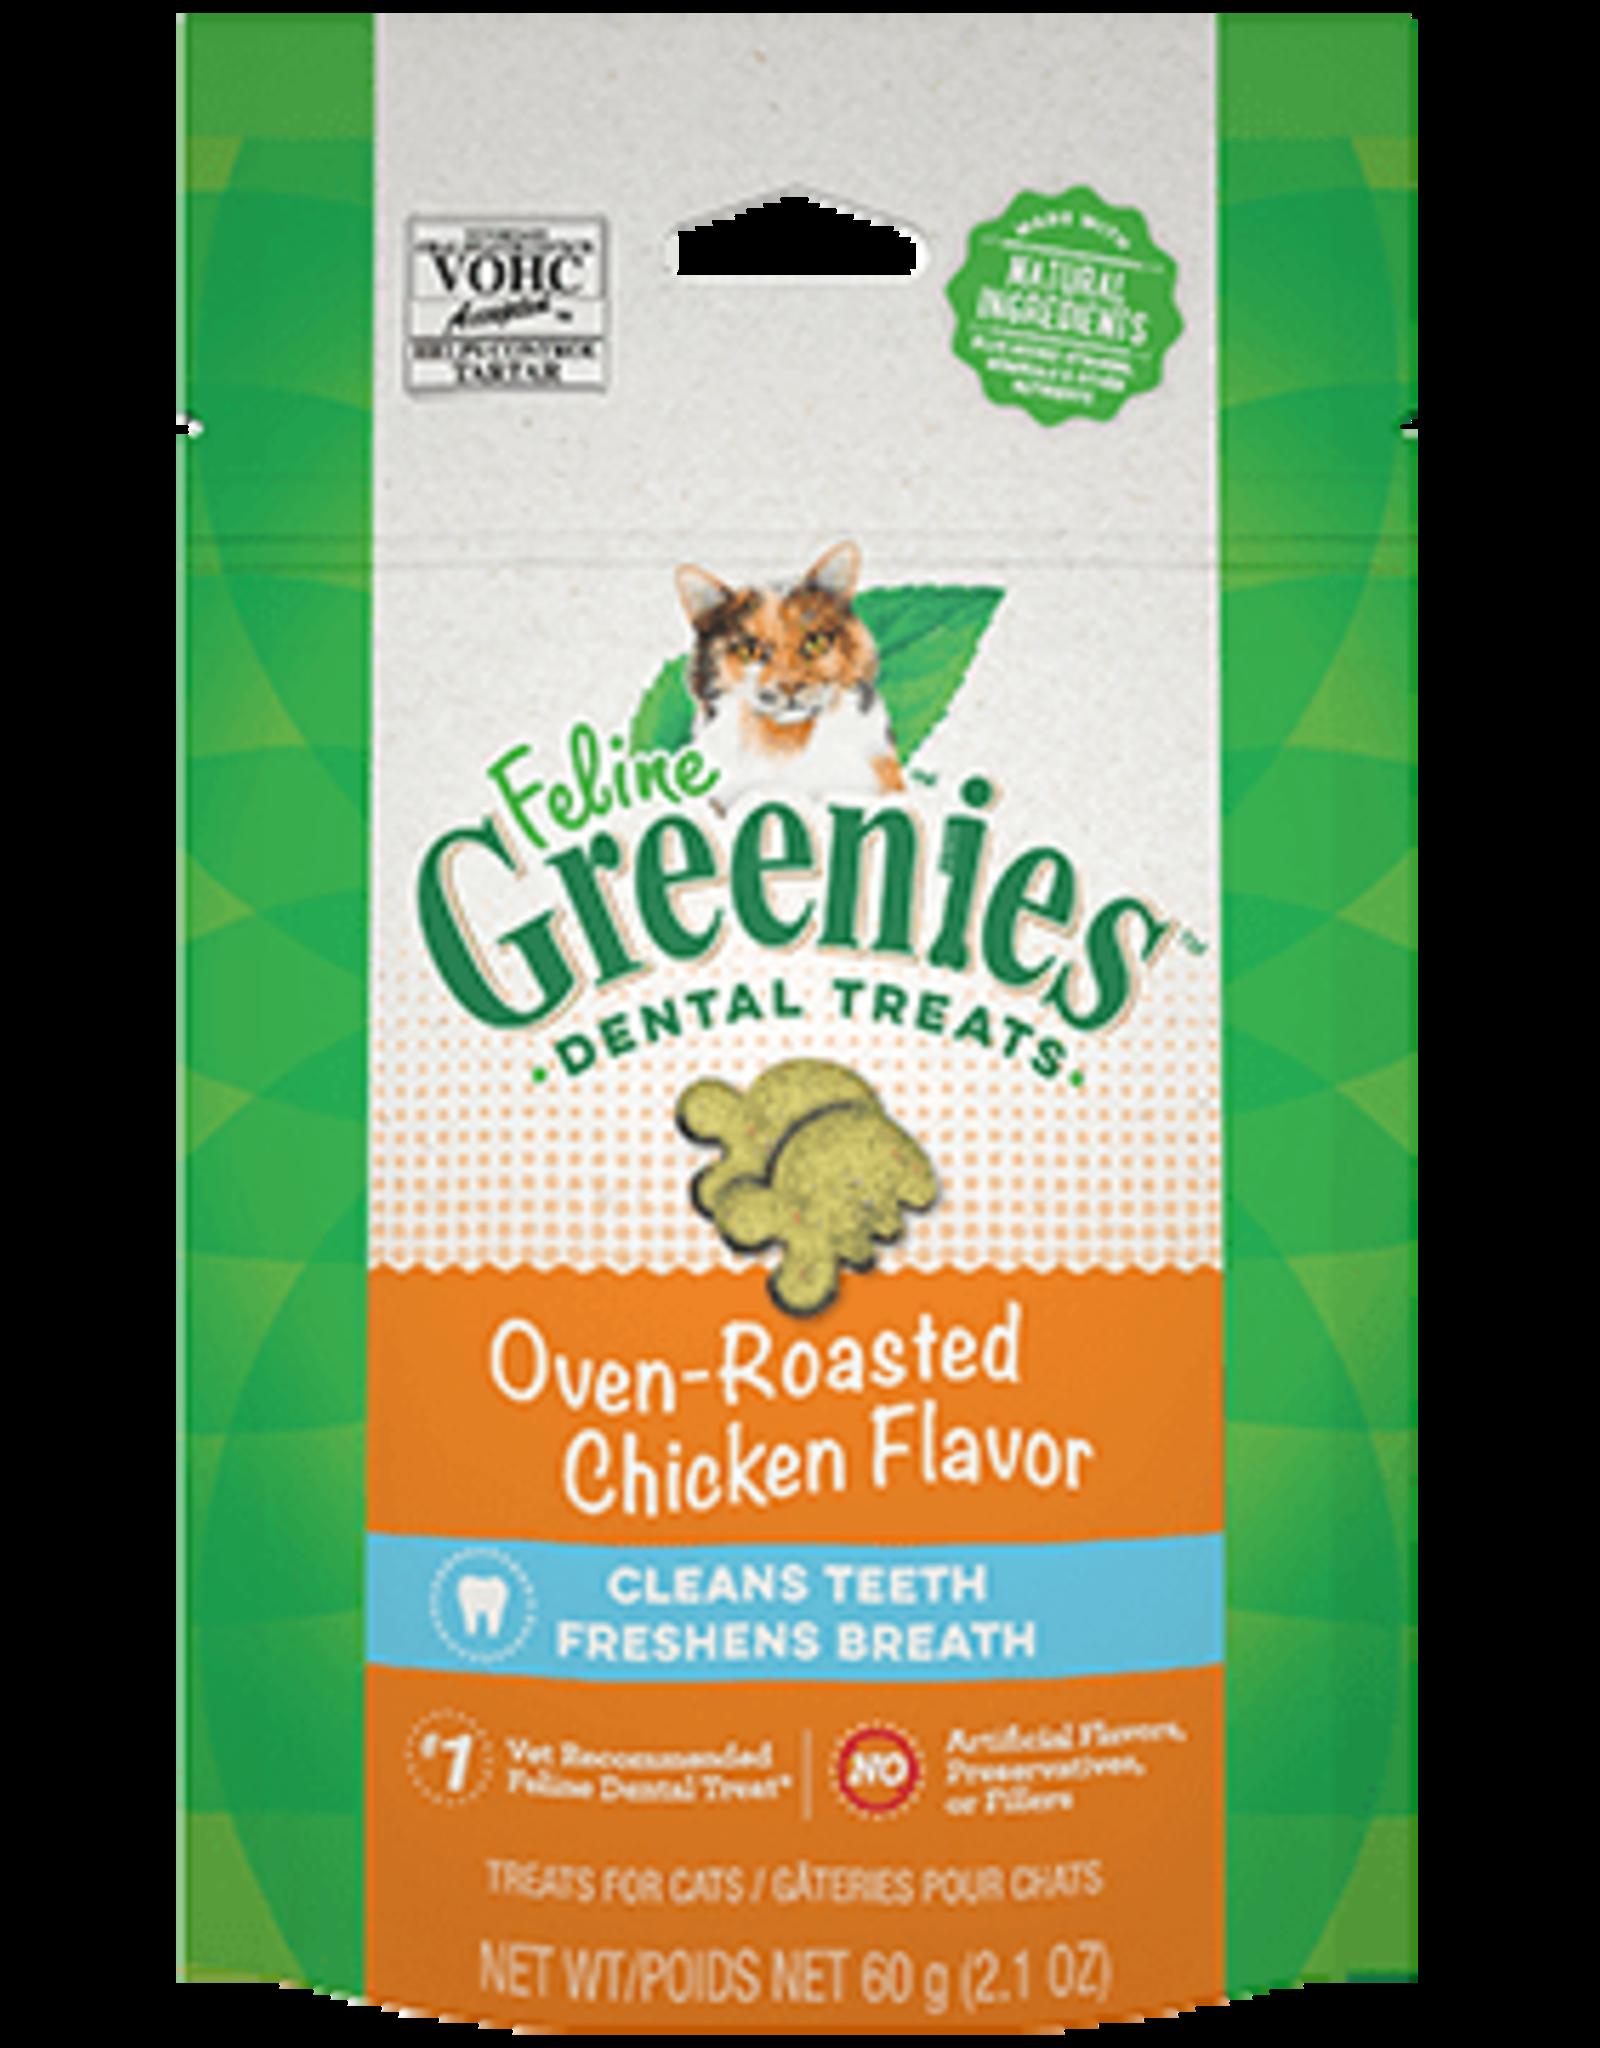 Greenies Feline Greenies Cat Dental Treats Oven-Roasted Chicken Flavor